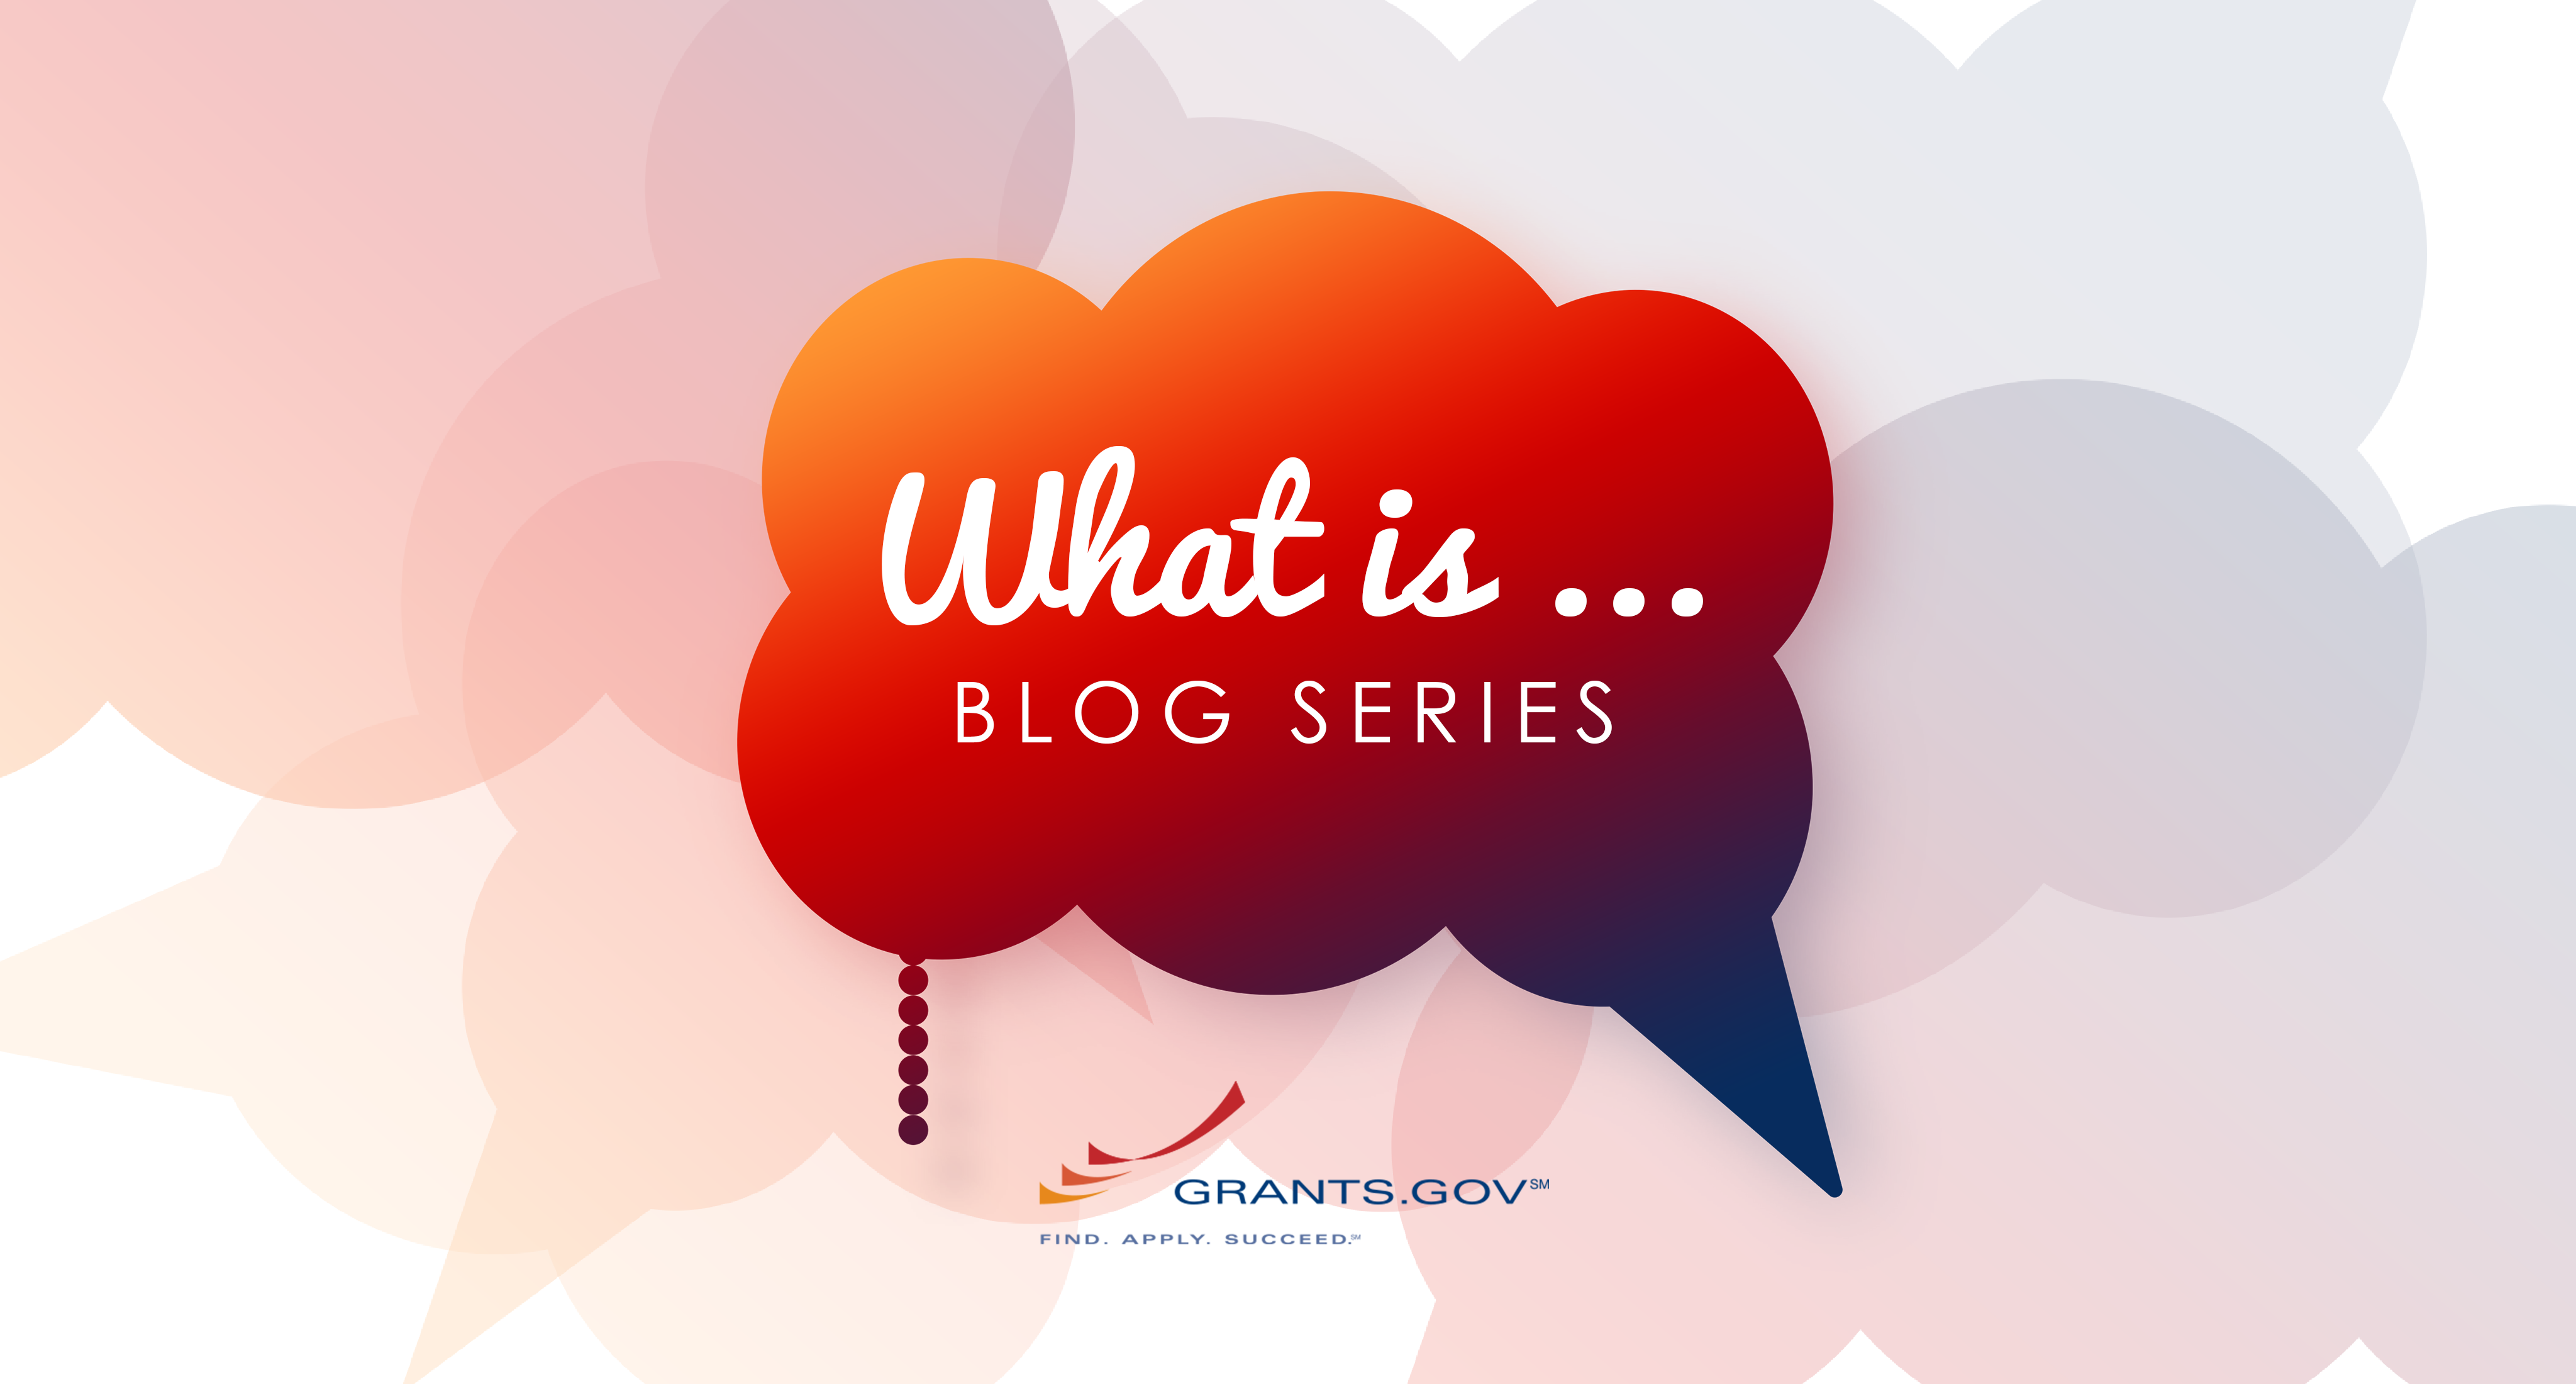 Grants.gov's What is... Blog Series